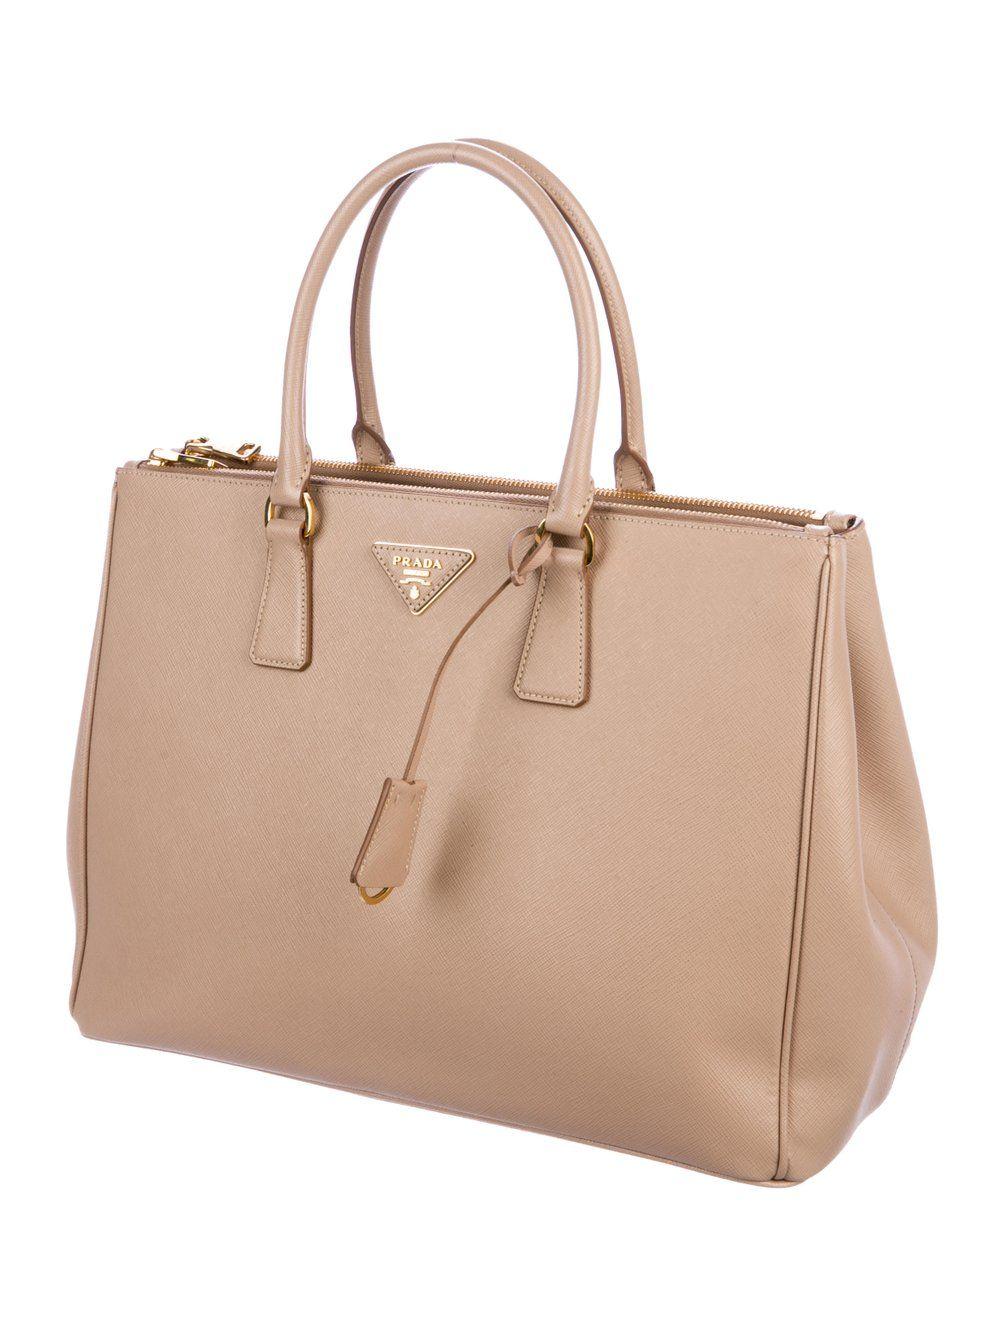 296b31179aaf24 Prada 2017 Medium Saffiano Lux Galleria Double Zip Tote - Handbags -  PRA265936 | The RealReal